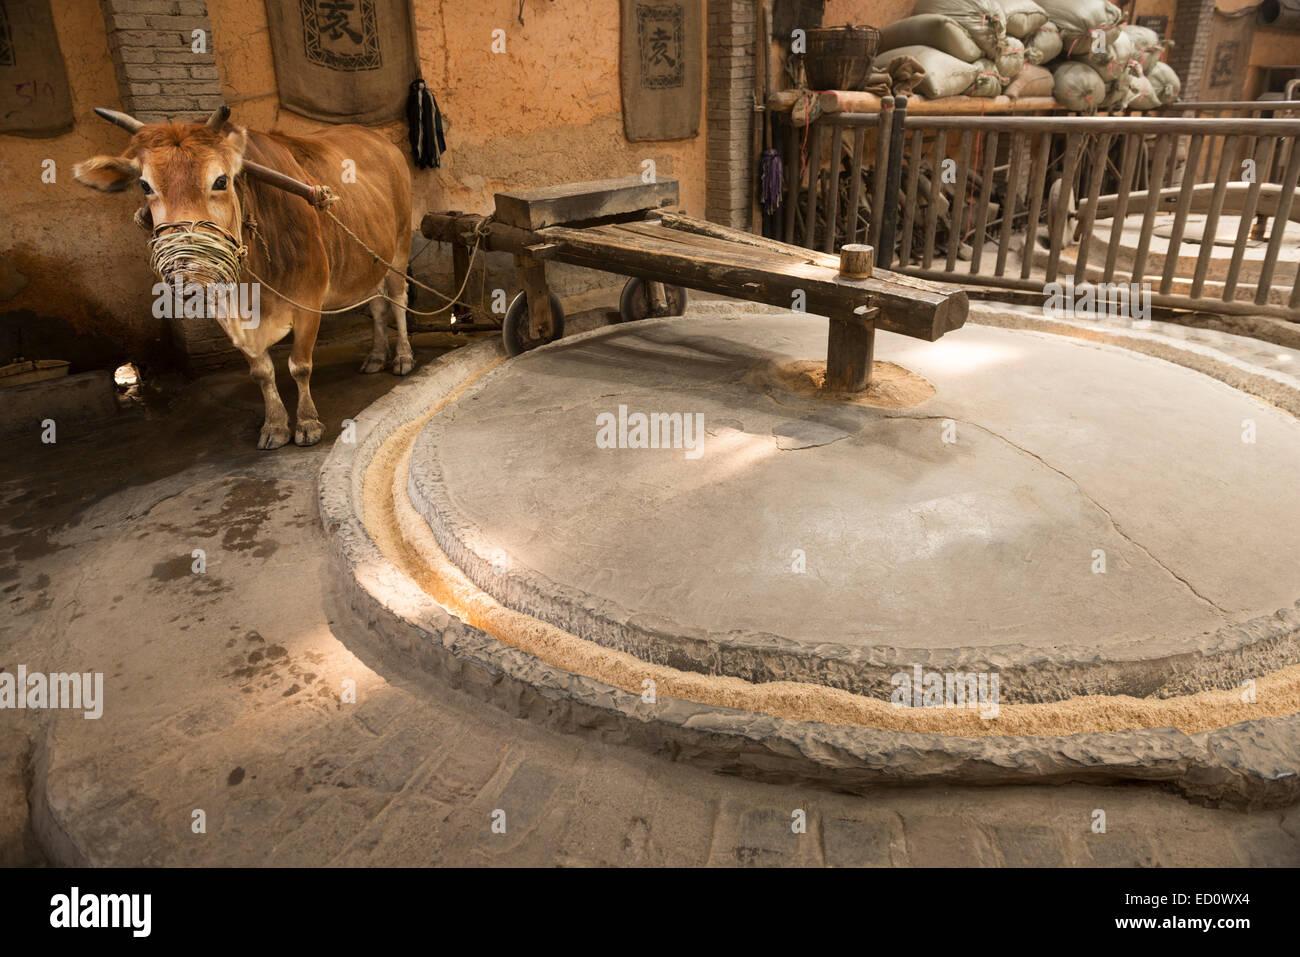 Ox powered grain mill at a rural history museum in Zhangjiajie, Hunan, China - Stock Image